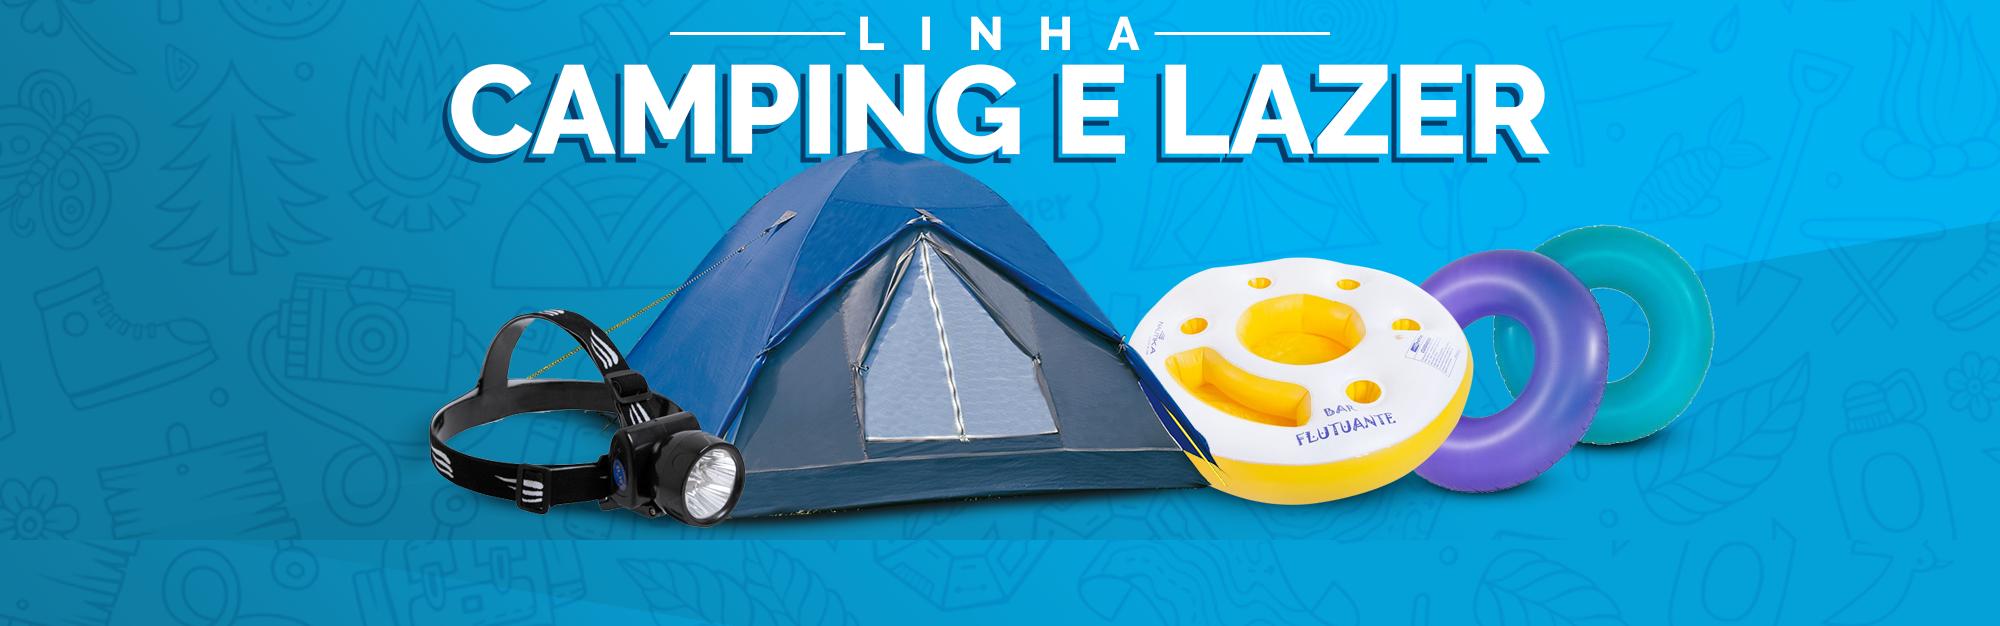 https://rlmstore.commercesuite.com.br/camping-e-aventura